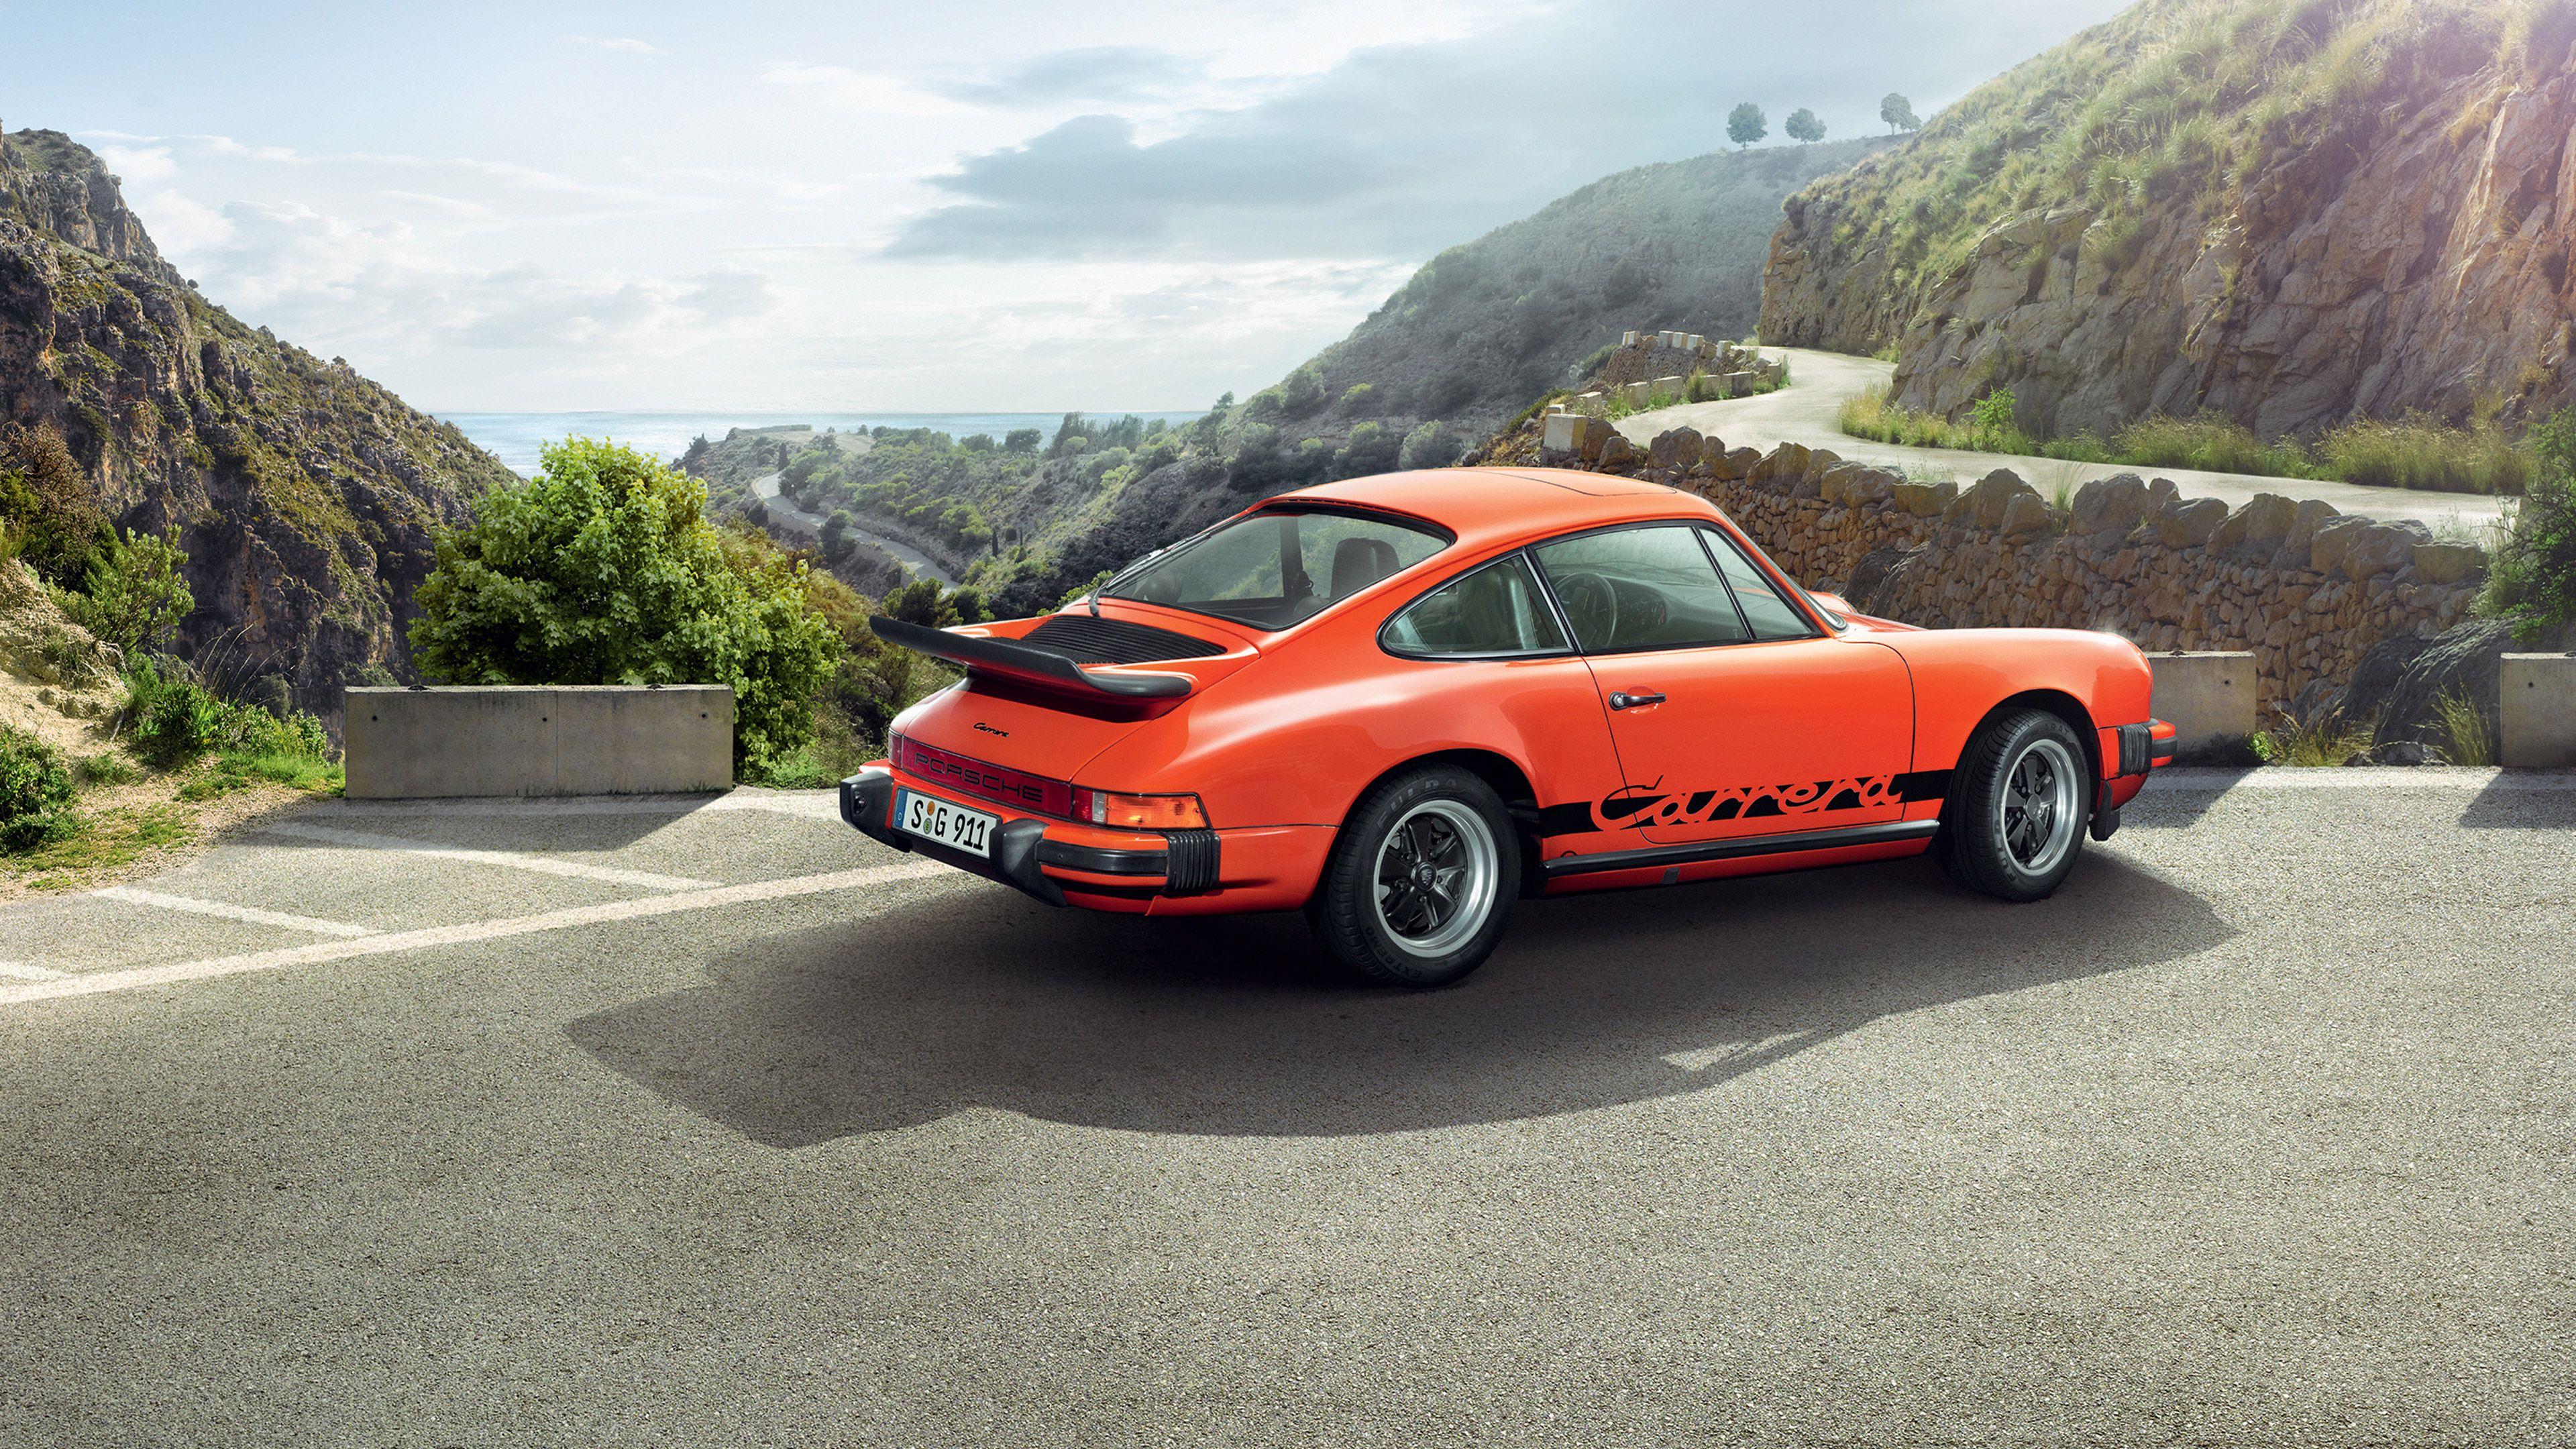 Porsche 911 Carrera Hd Porsche Wallpapers Porsche 911 Wallpapers Cars Wallpapers Classic Porsche Porsche 911 Carrera Porsche 911